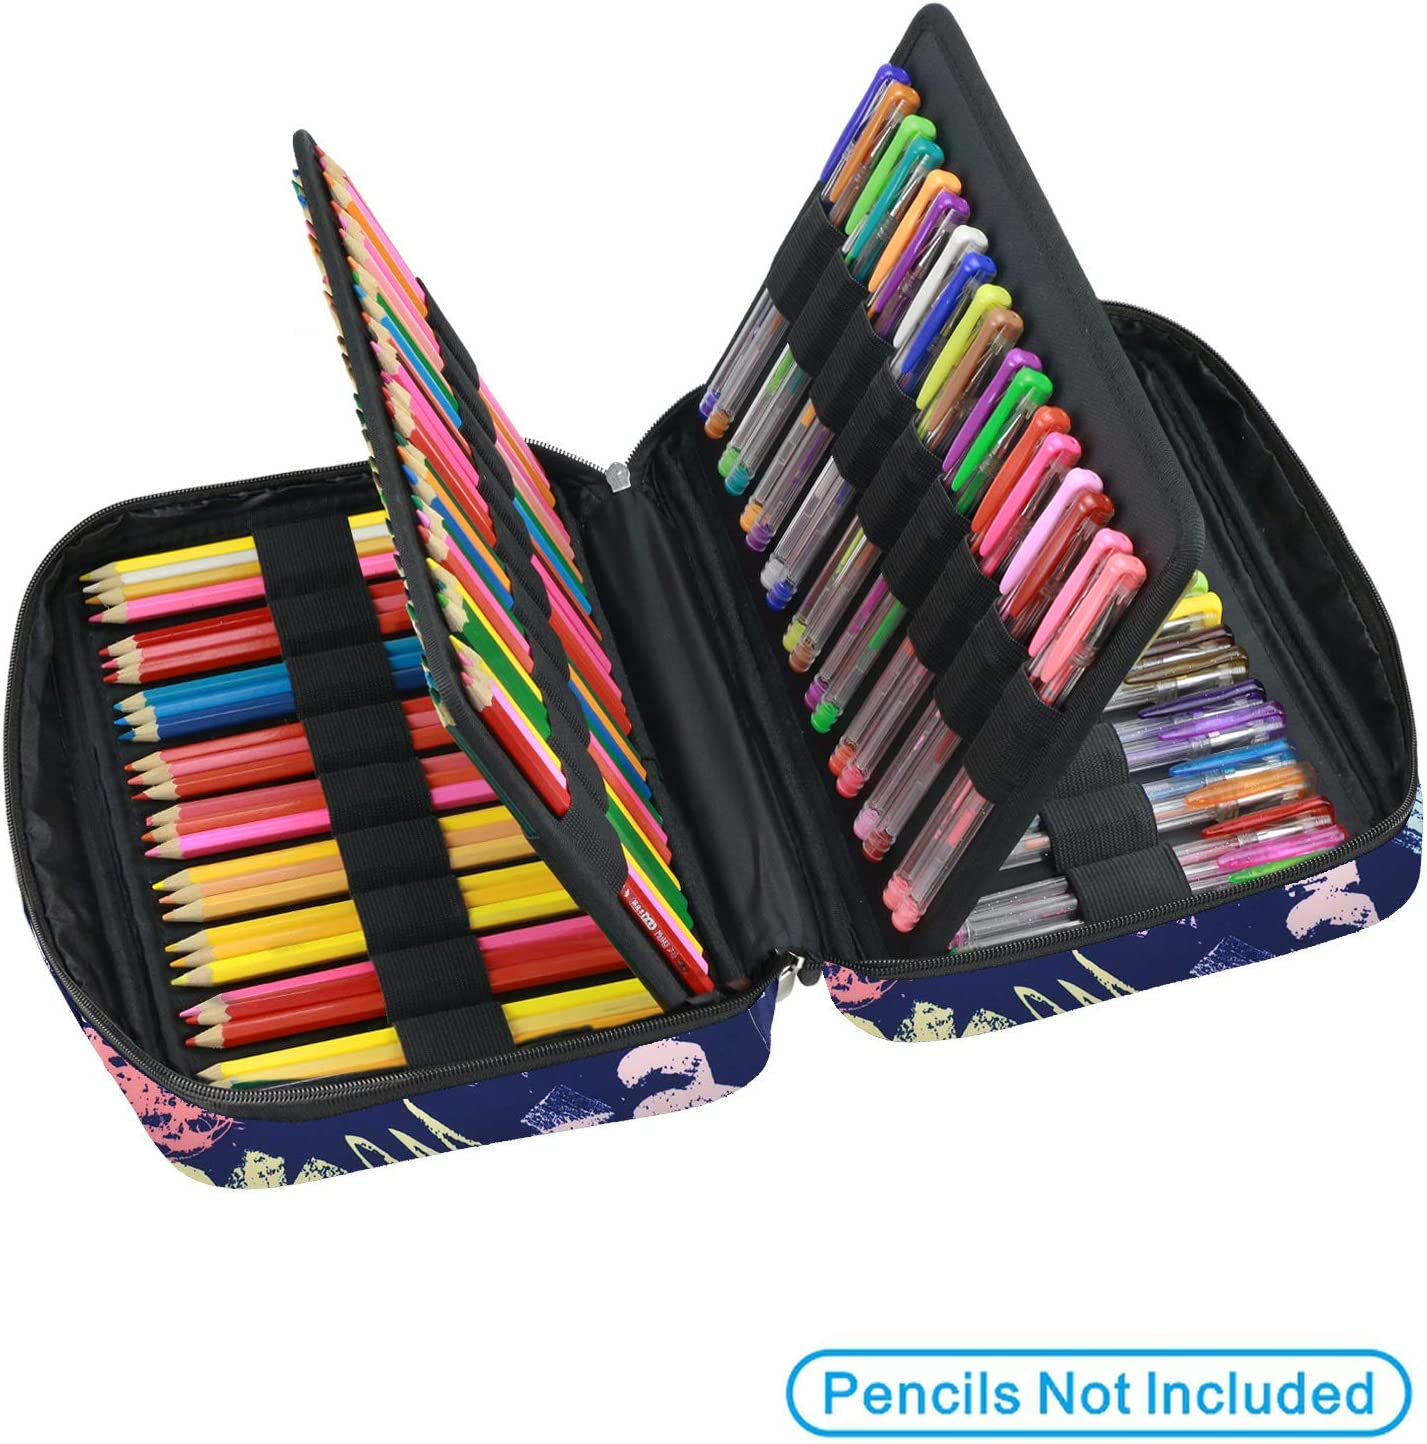 YOUSHARES Colored Pencil Case 166 Slots Pen Case Organizer with Handy Wrap /& Zipper Sports Cat Multilayer Holder for Prismacolor Colored Pencils /& Gel Pen